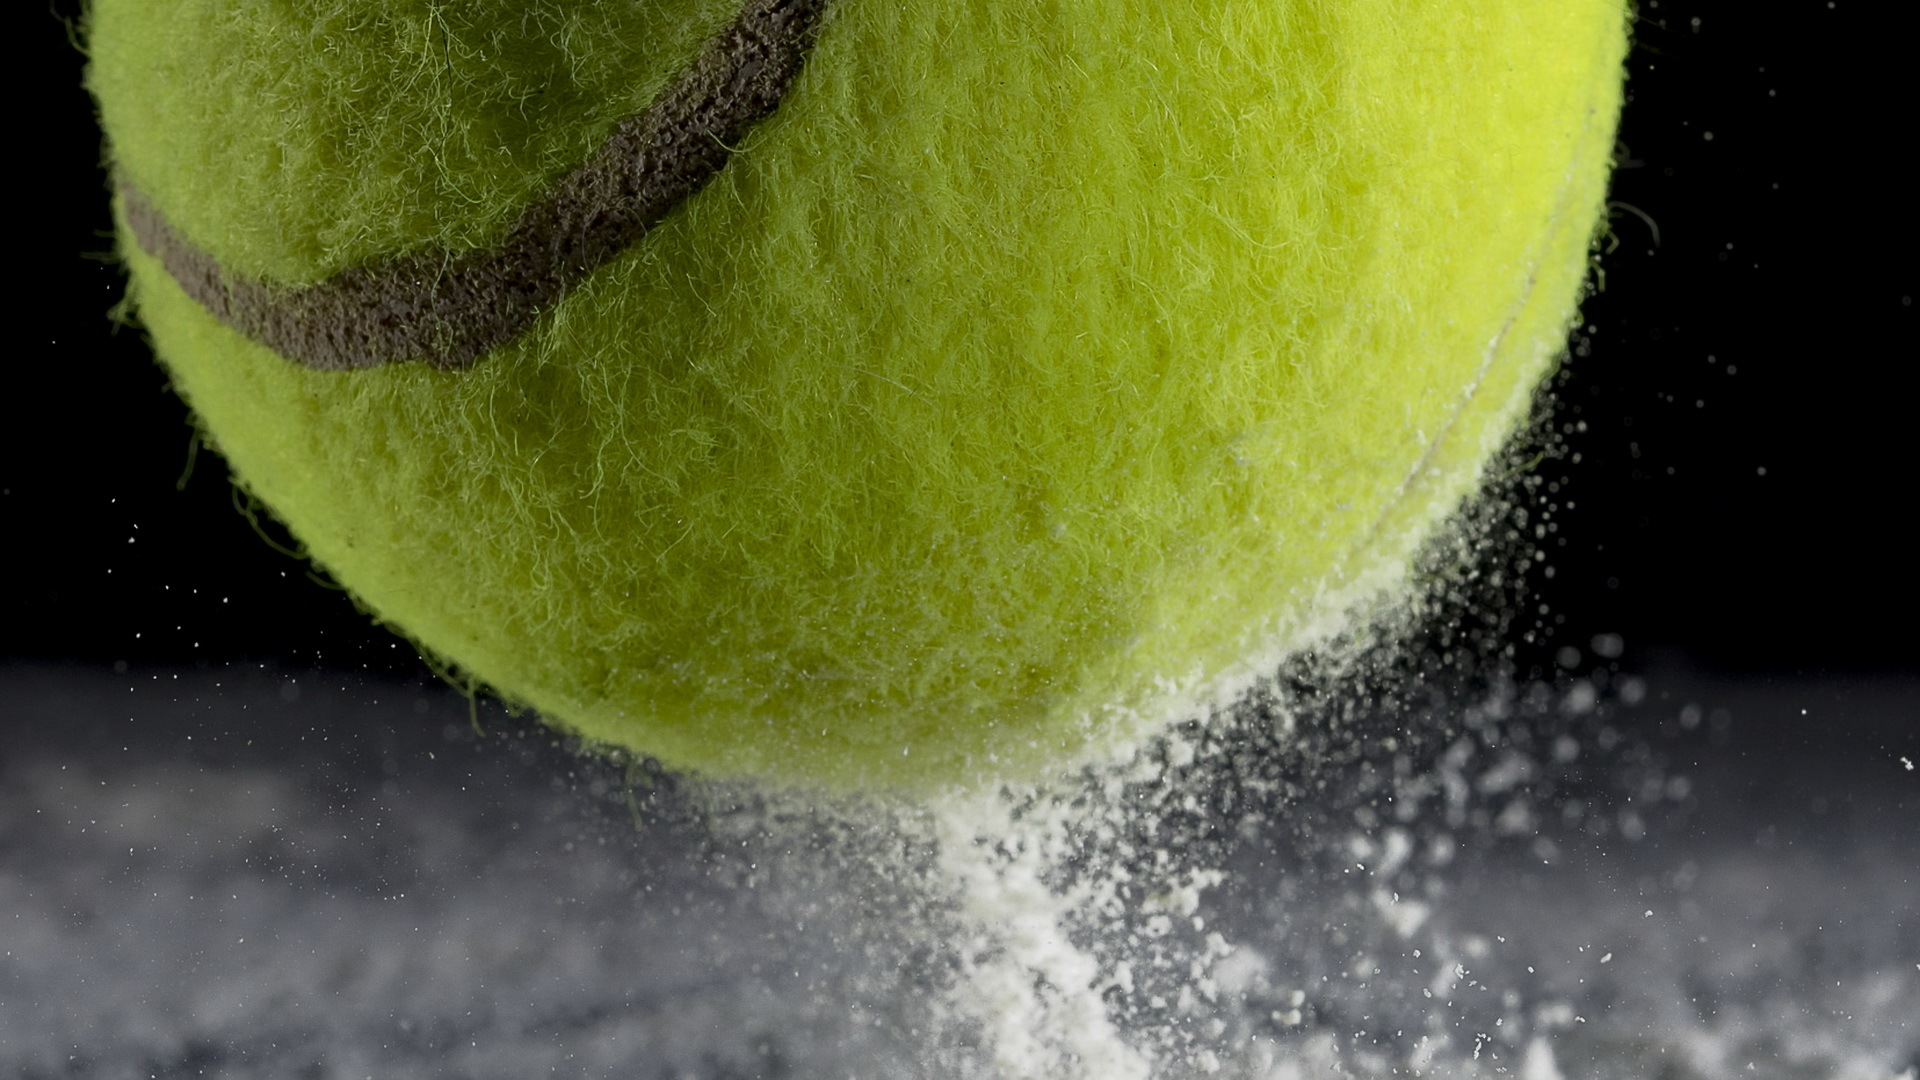 Tennis Player Wallpaper Hd - DOWNLOAD FREE HD WALLPAPERS | 1080x1920